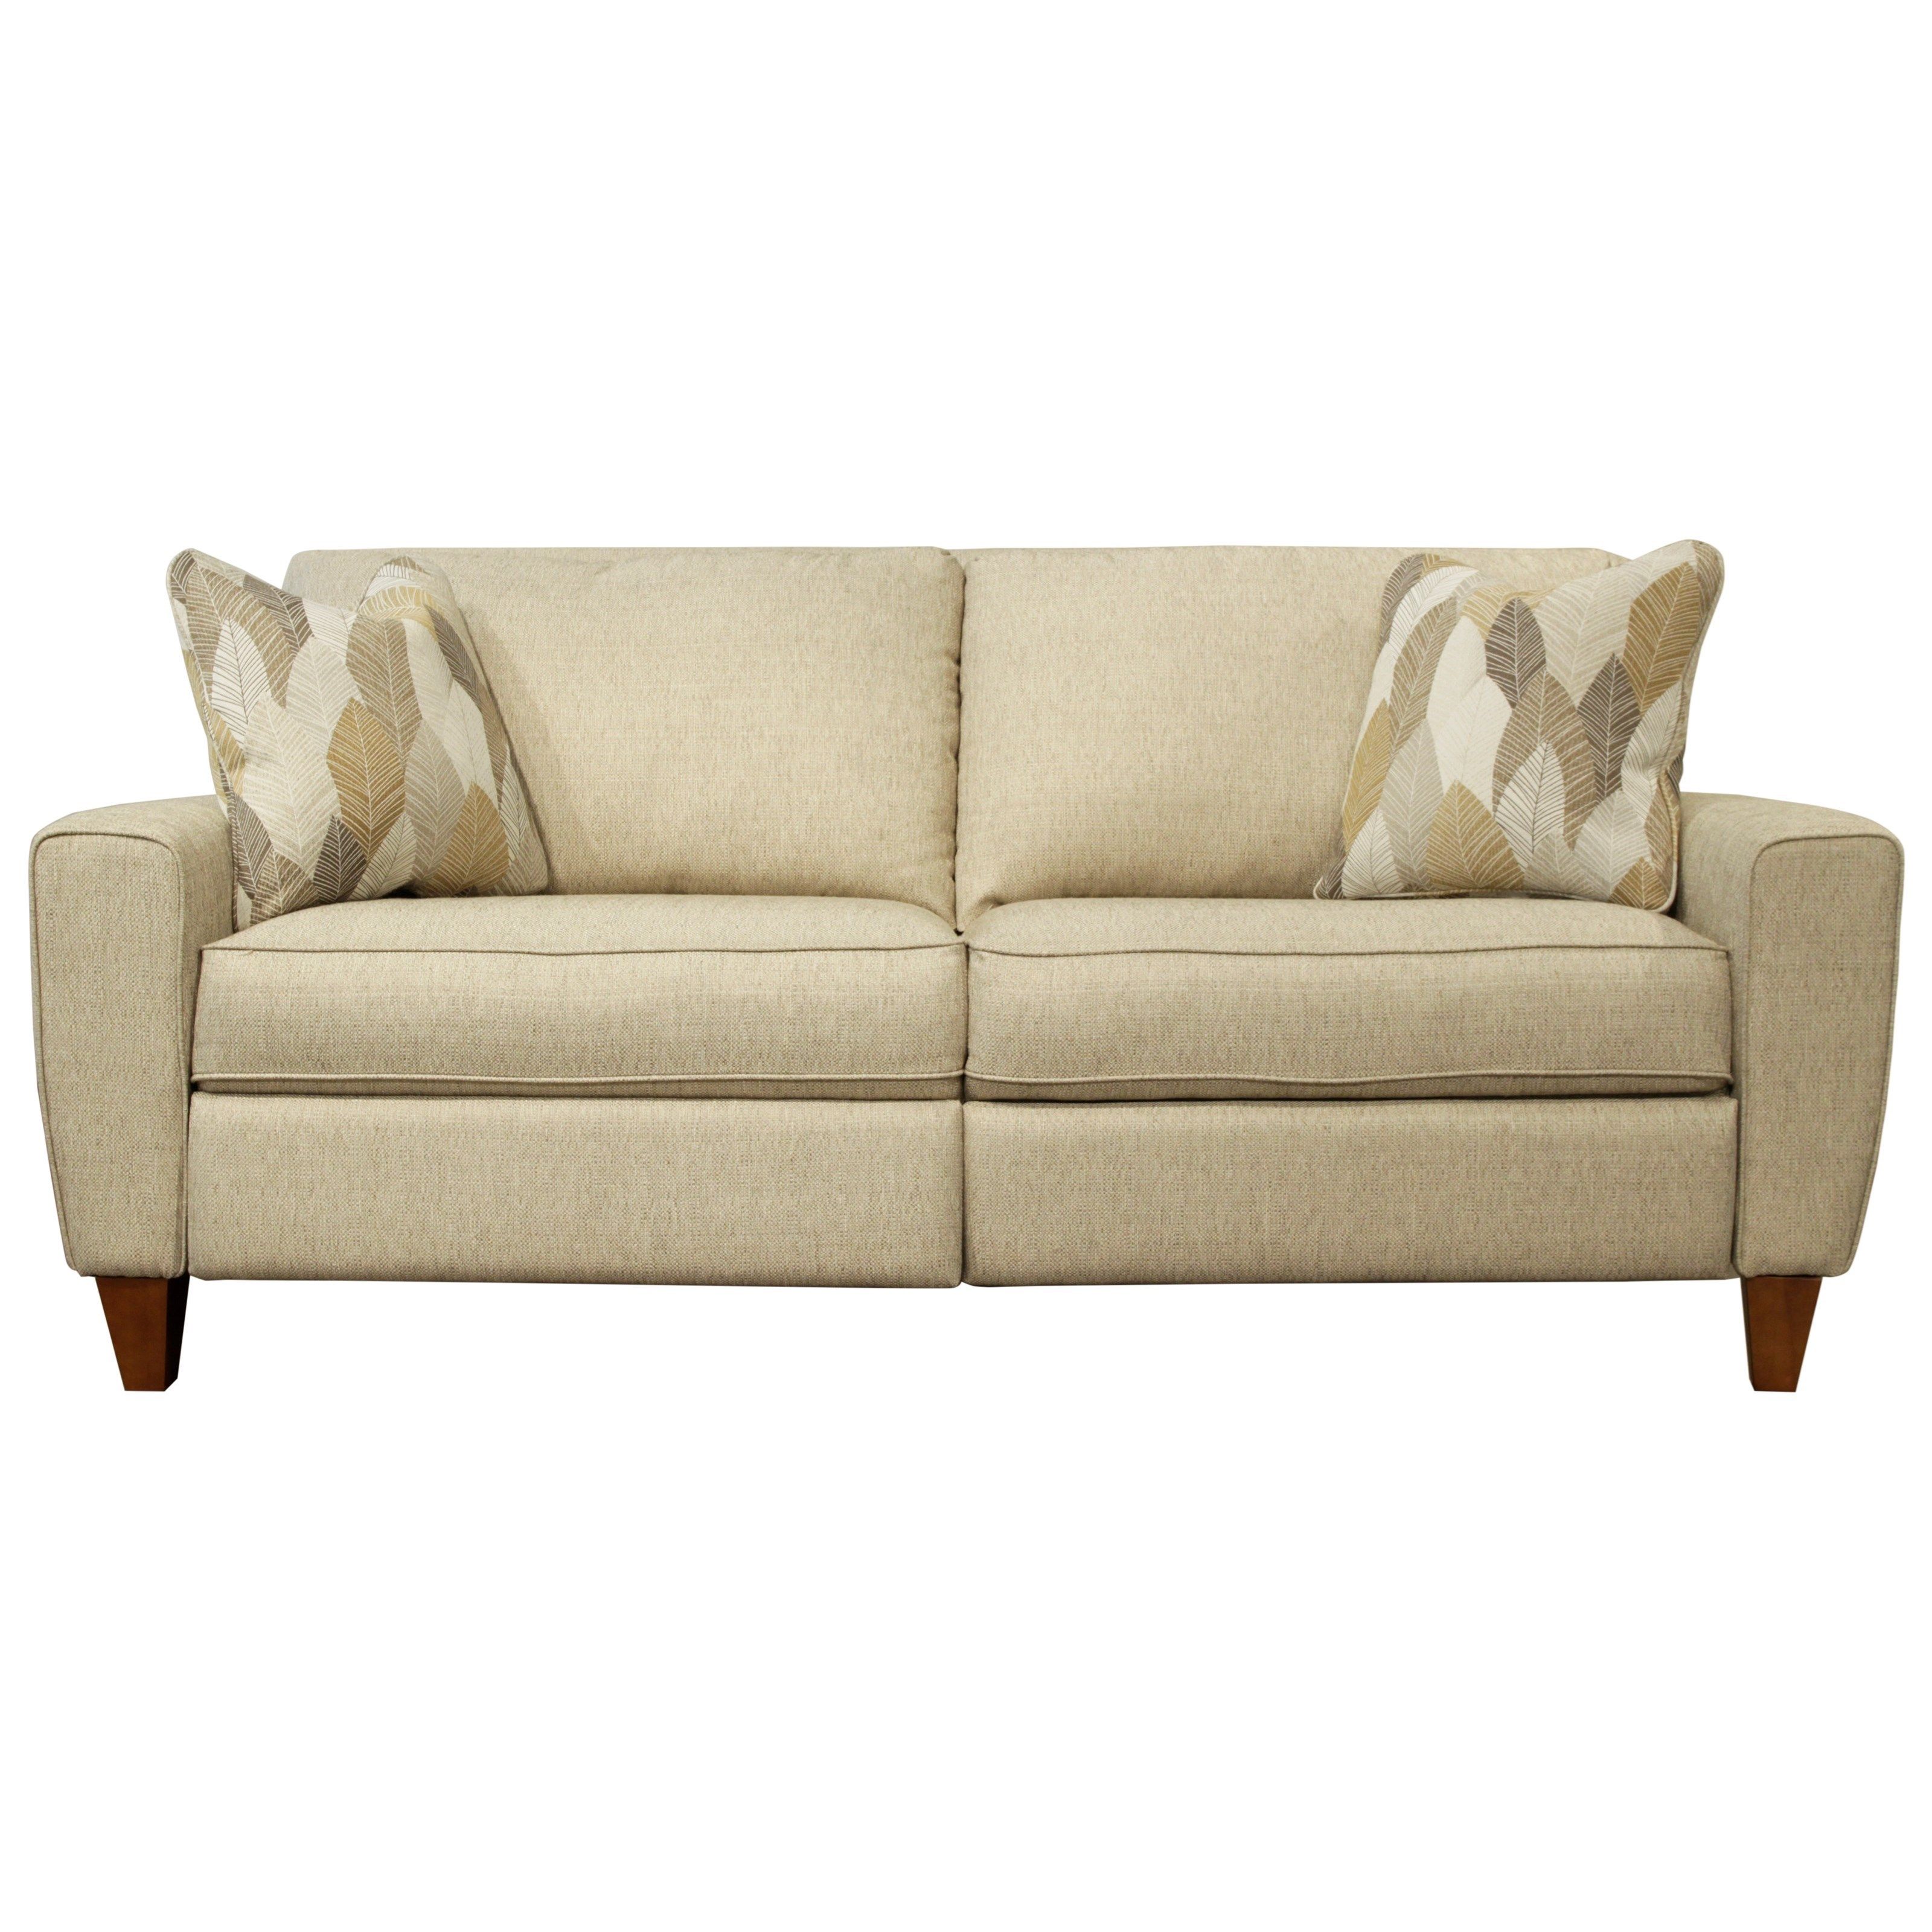 Duo™Reclining 2 Seat Sofa